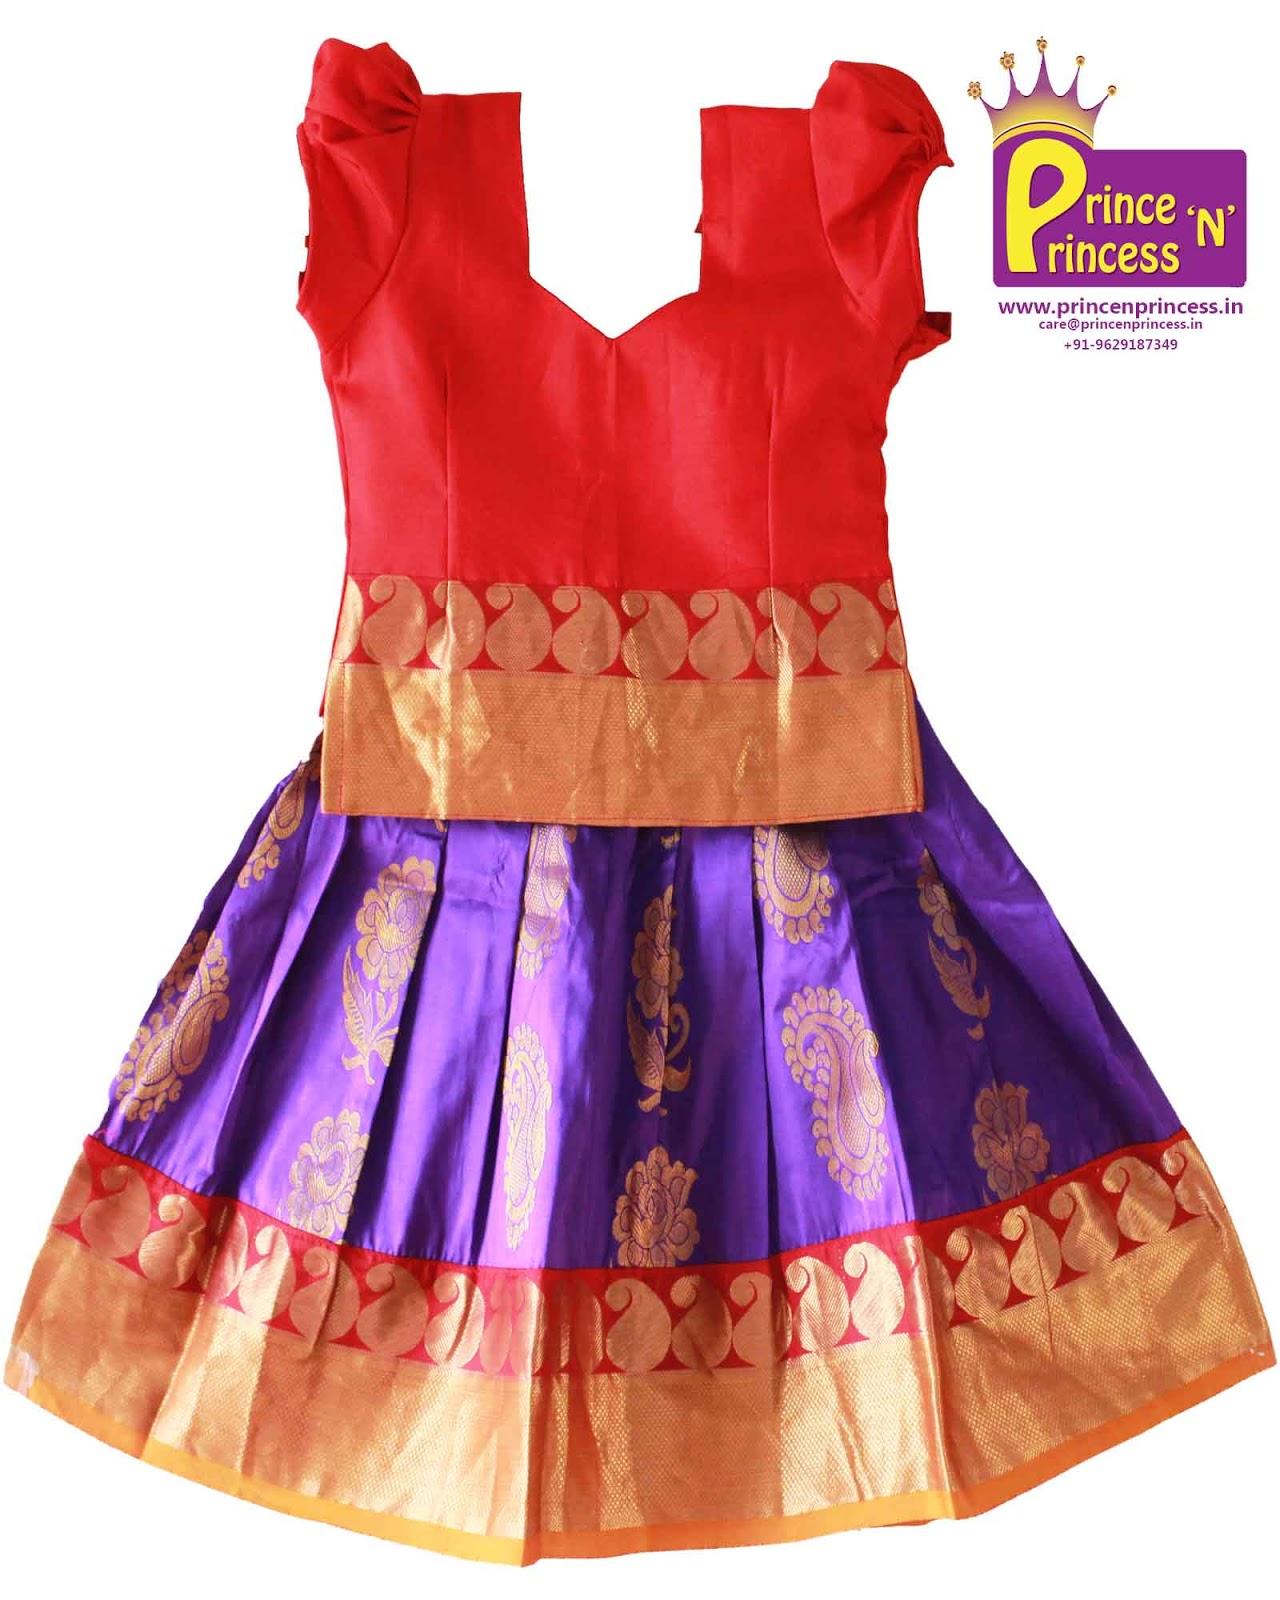 5fe4d7ca4 Kancheepuram Silk Pavadai langa for 6 months Baby – www ...